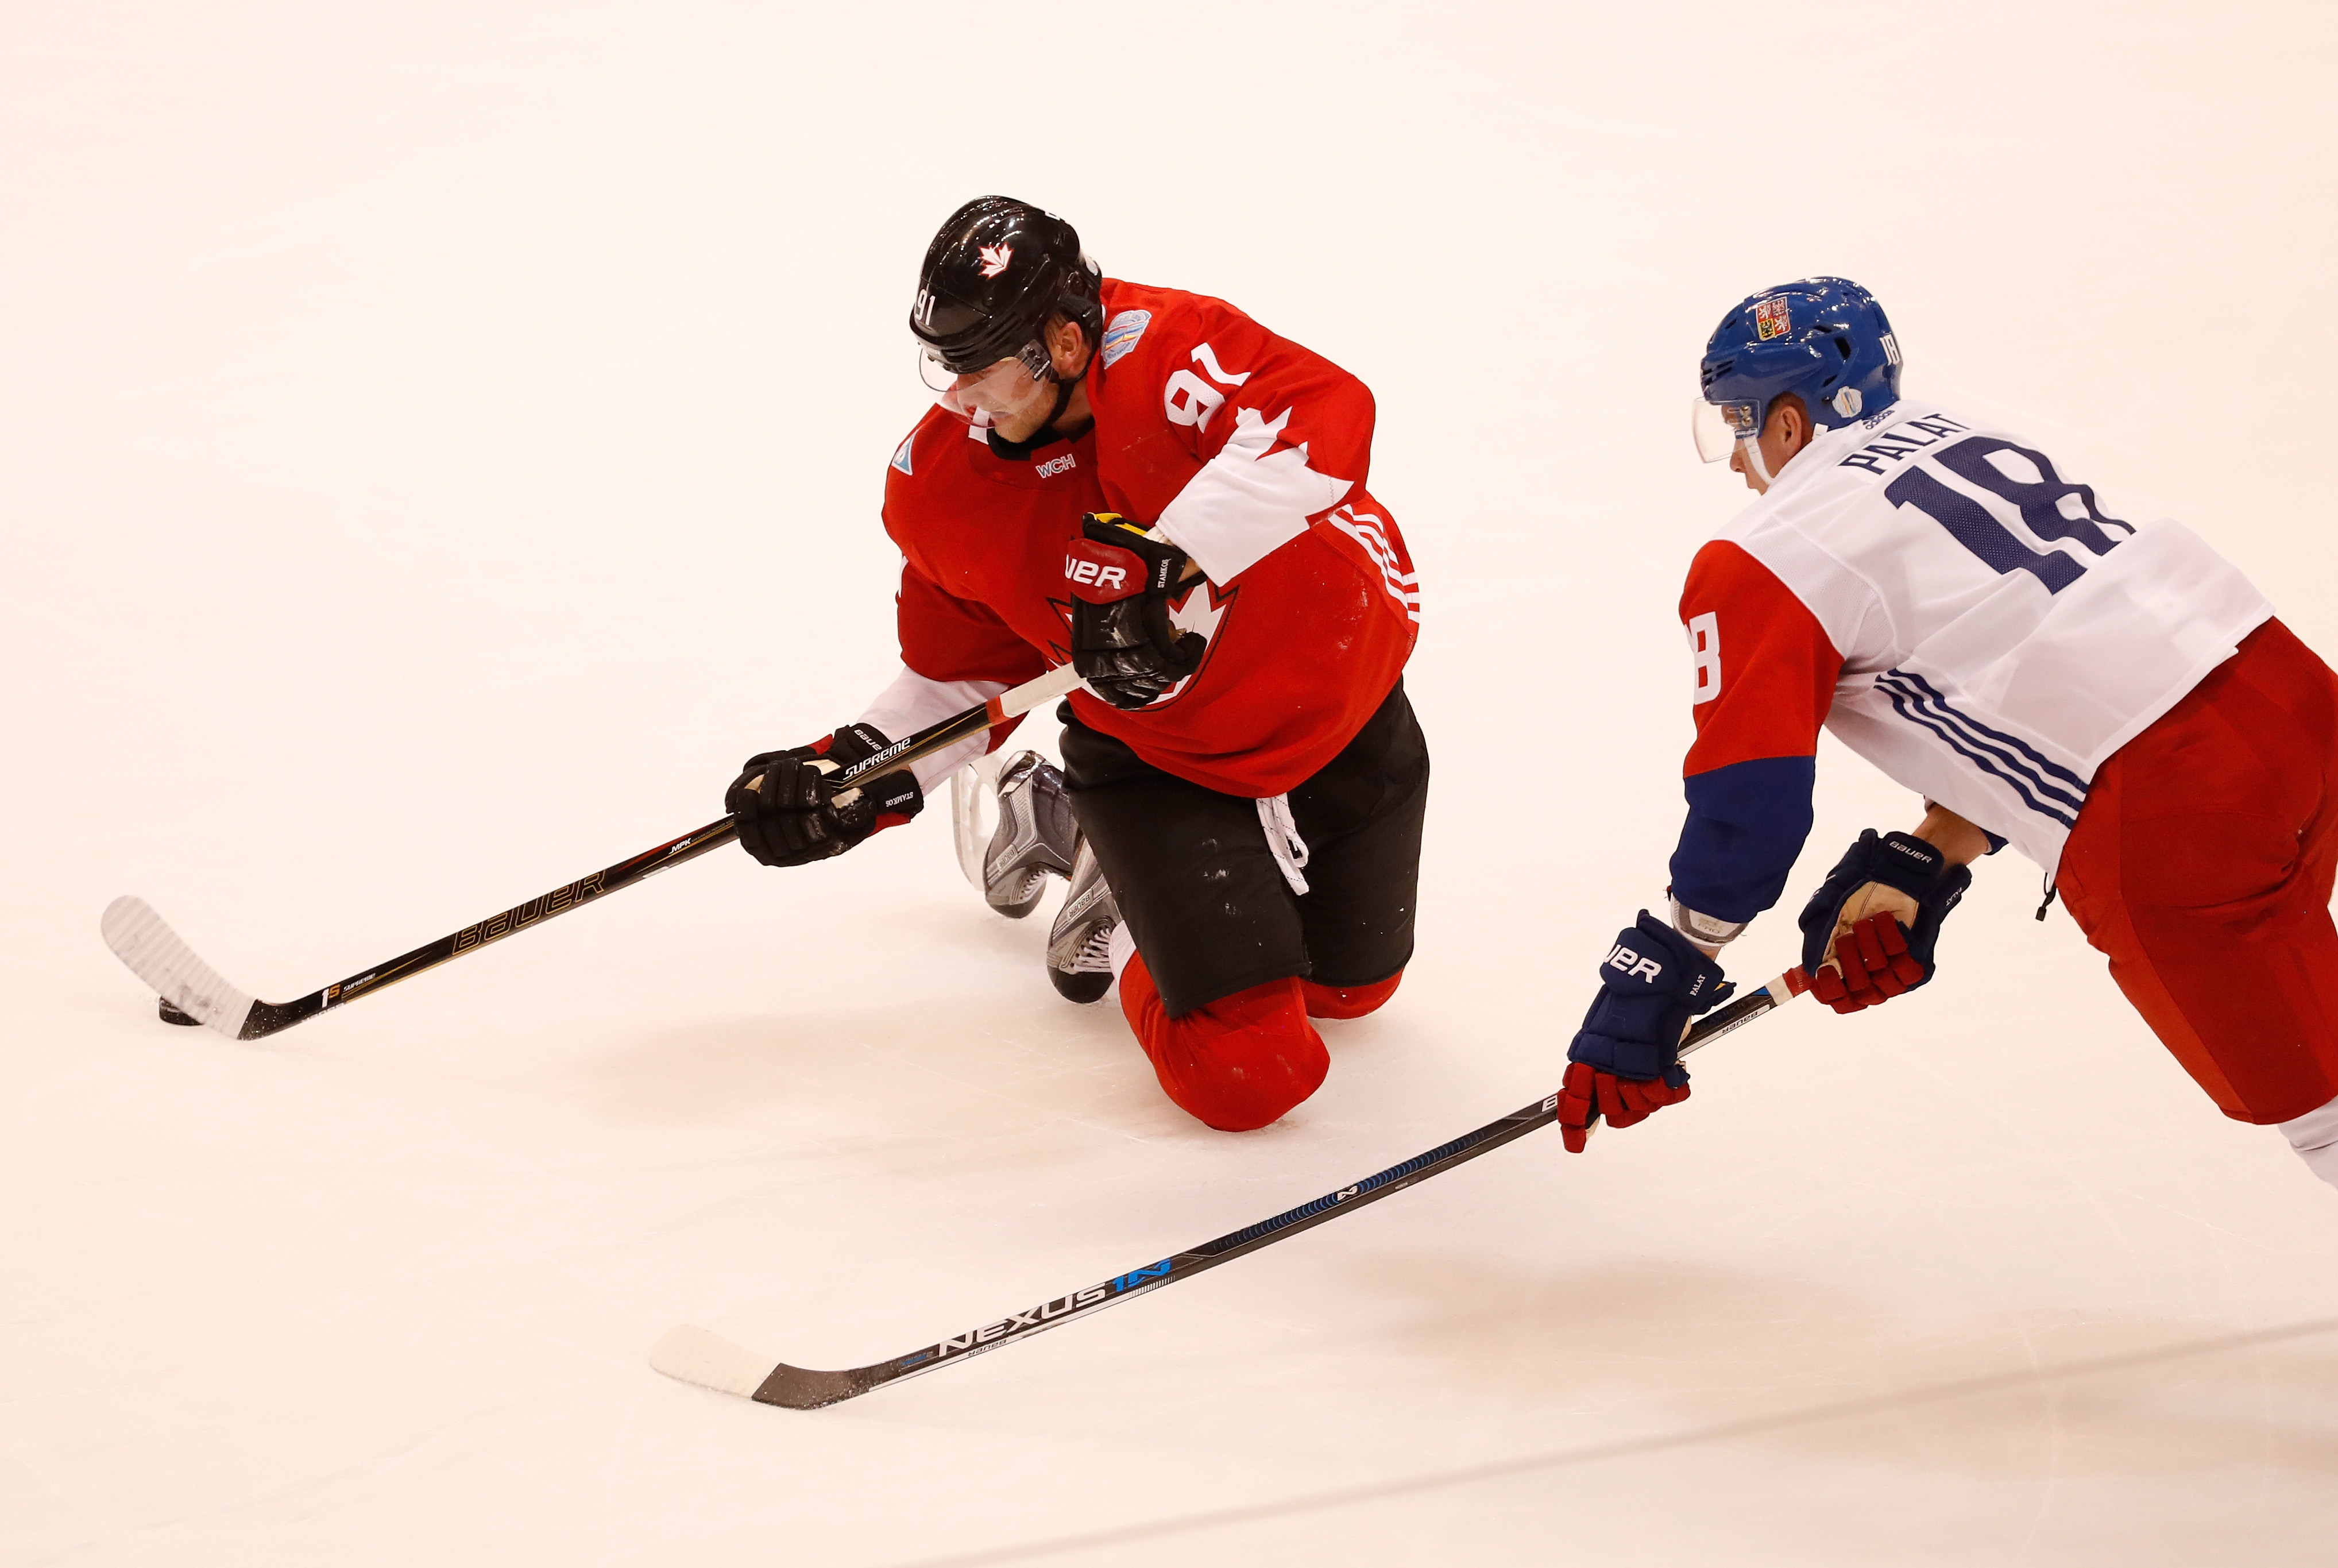 World Cup Of Hockey 2016 - Czech Republic v Canada